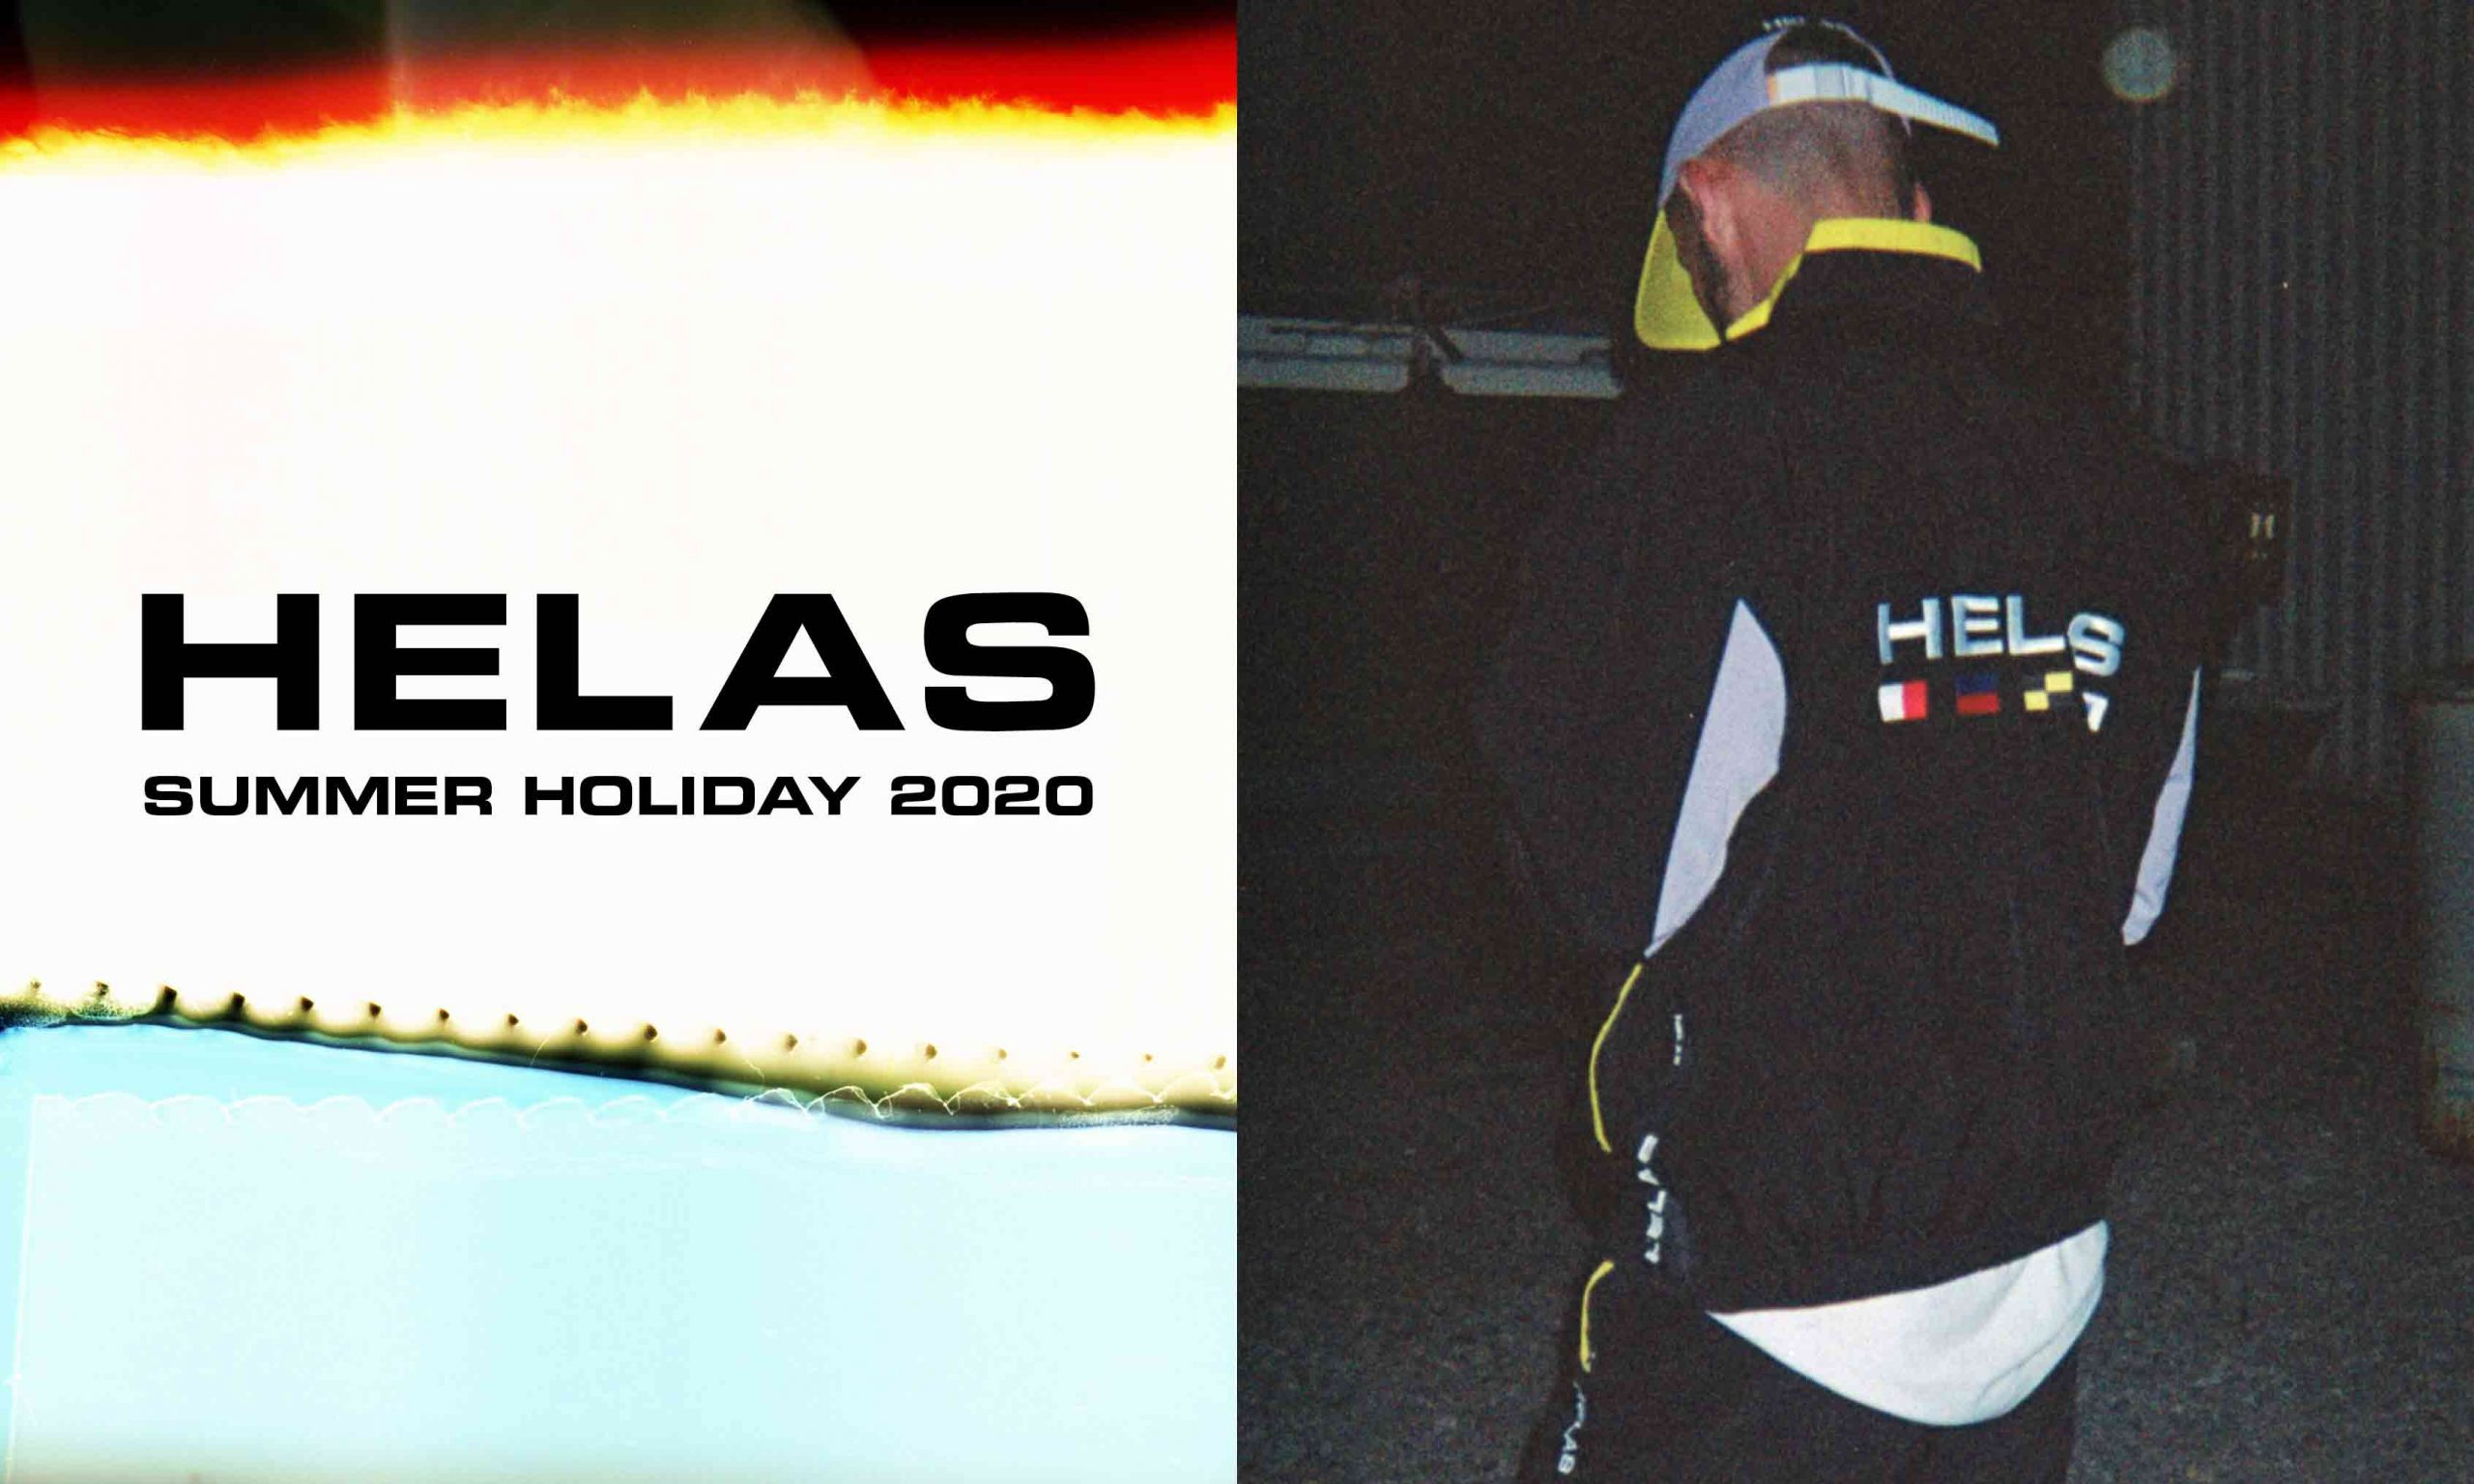 HELAS 2020 夏季假日系列发布